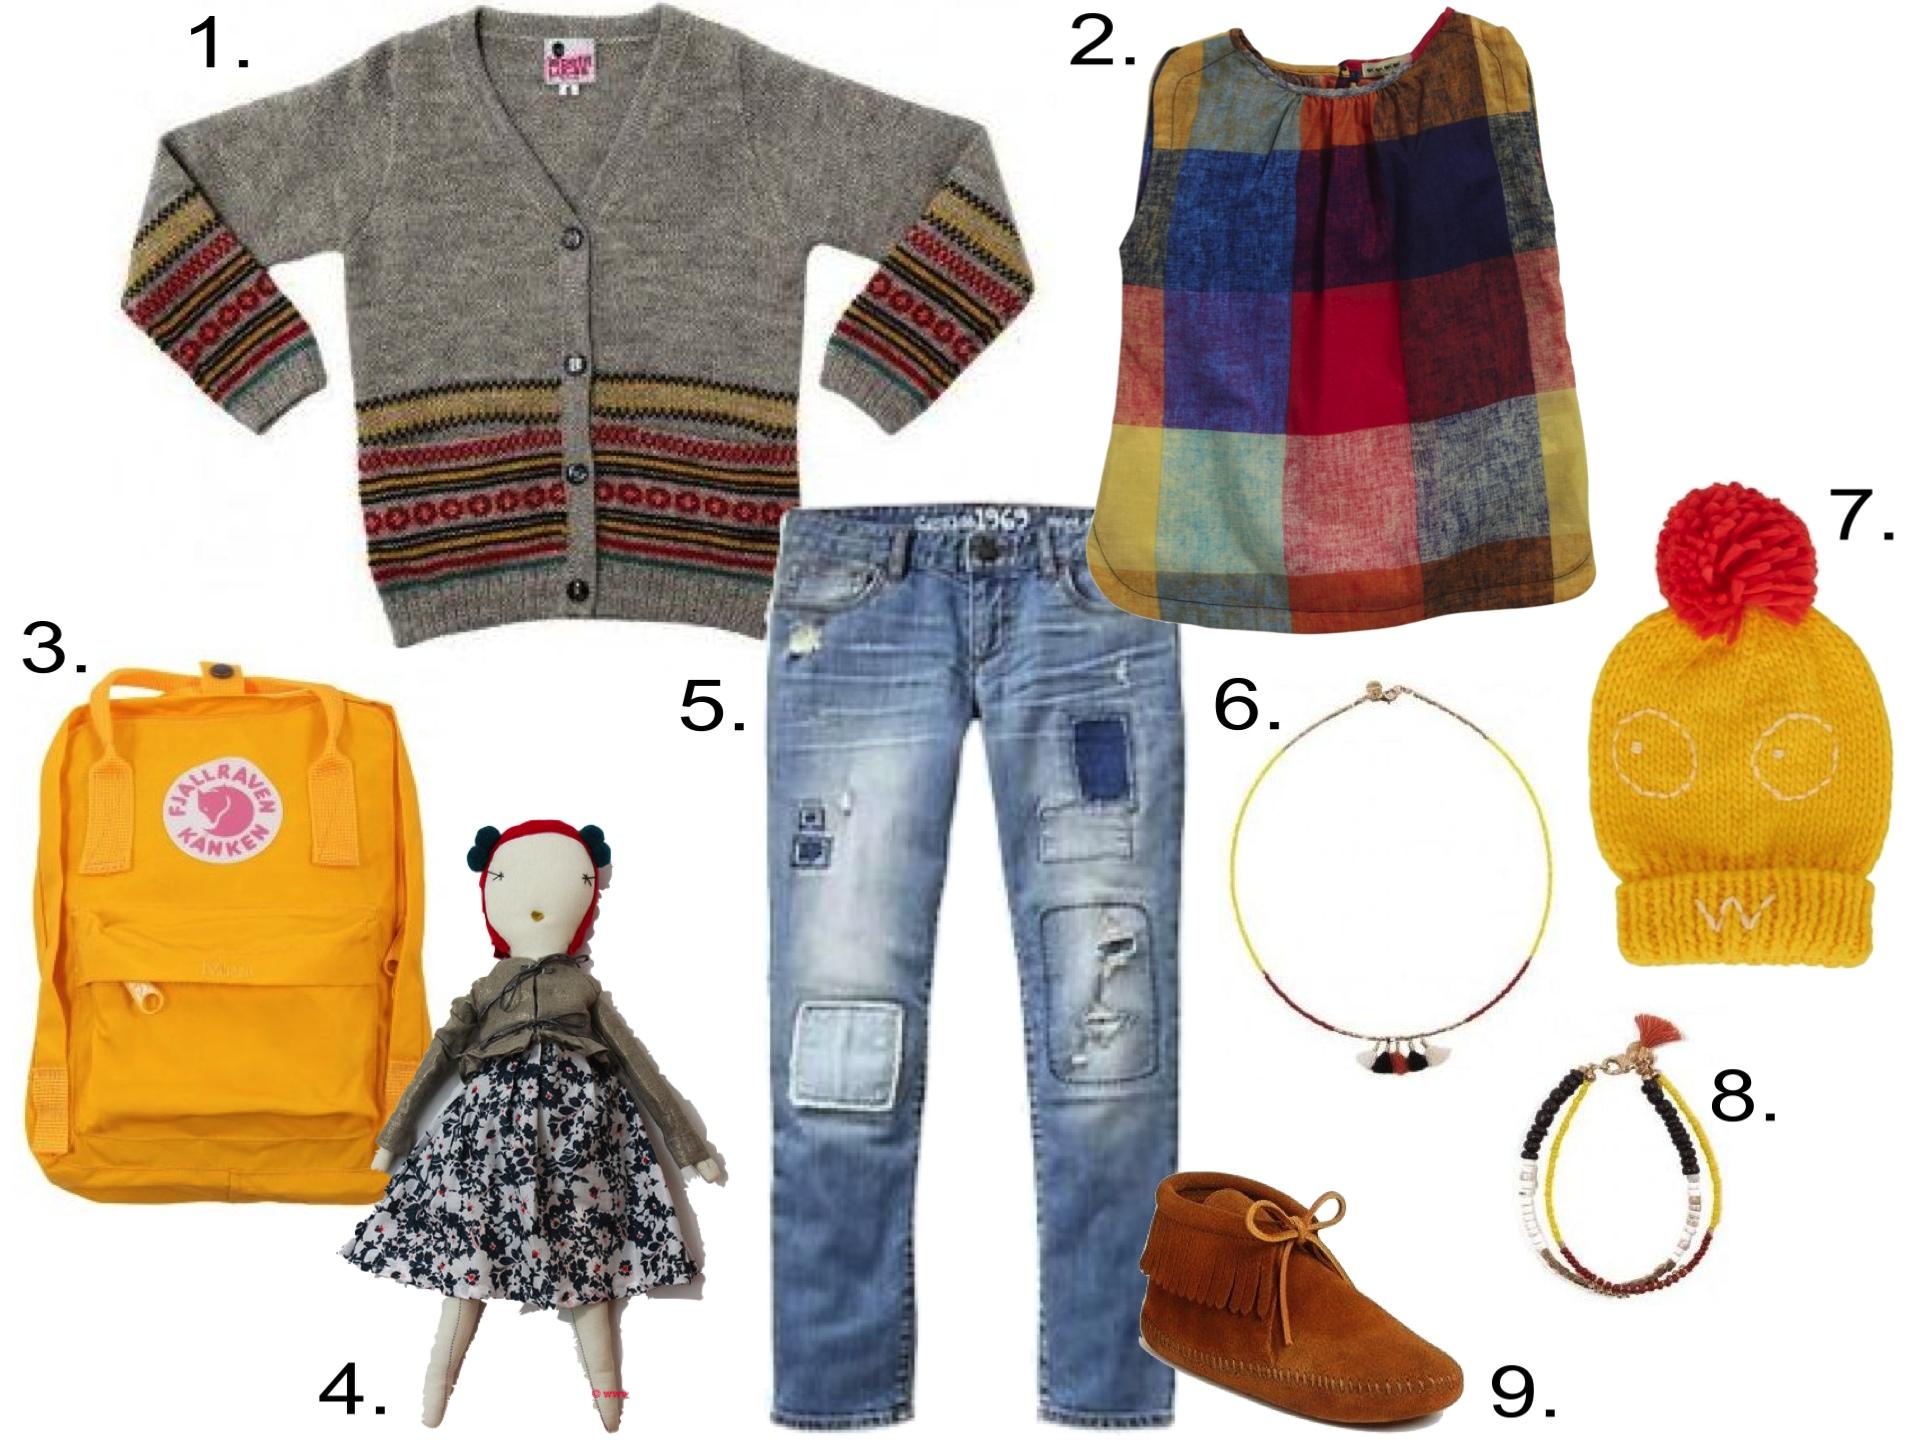 transition her pretty Plaid Sleeveless Shirt to Fall... 1.  LE PETIT LUCAS DU TERTRE Cardigan  2.  Anthem of the Ants Pretty Shell Top  3.  FJALLRAVEN Mini Kanken Back Pack  4.  JESS BROWN RAG DOLL NO. 2  5.  GAP 1969 Rip & Repair super Jeans  6.  POLDER Zanzibar Necklace   7.  Individual Bobble Hat  8.  POLDER Zanzibar Bracelet  9.  Minnetonka 'Classic Fringe' Boot